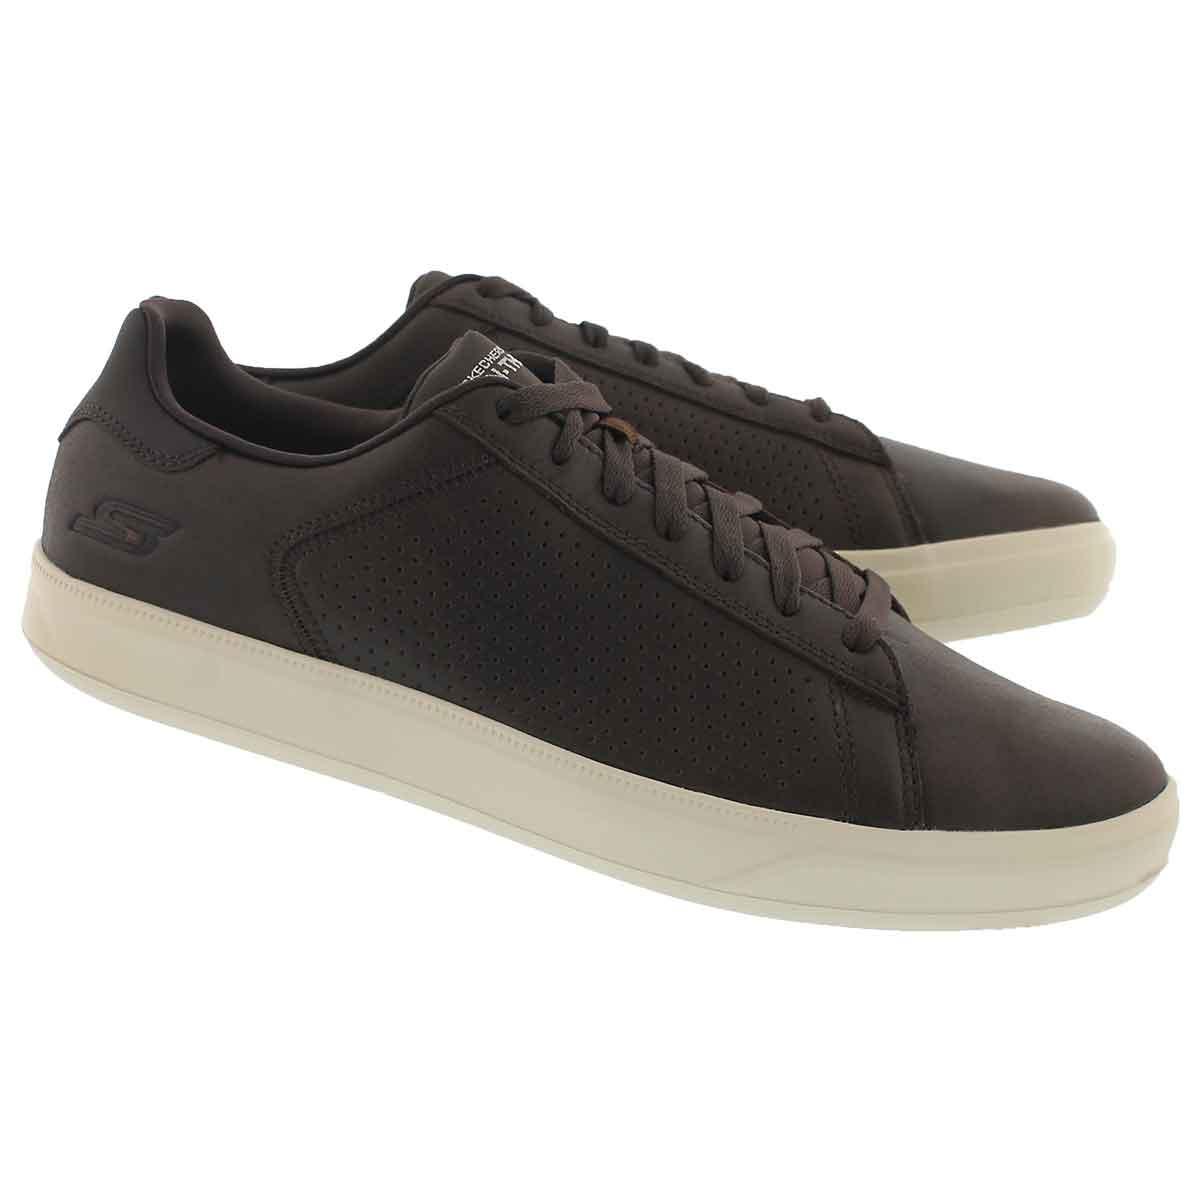 Mns GO Vulc 2 chocolate fashion sneaker